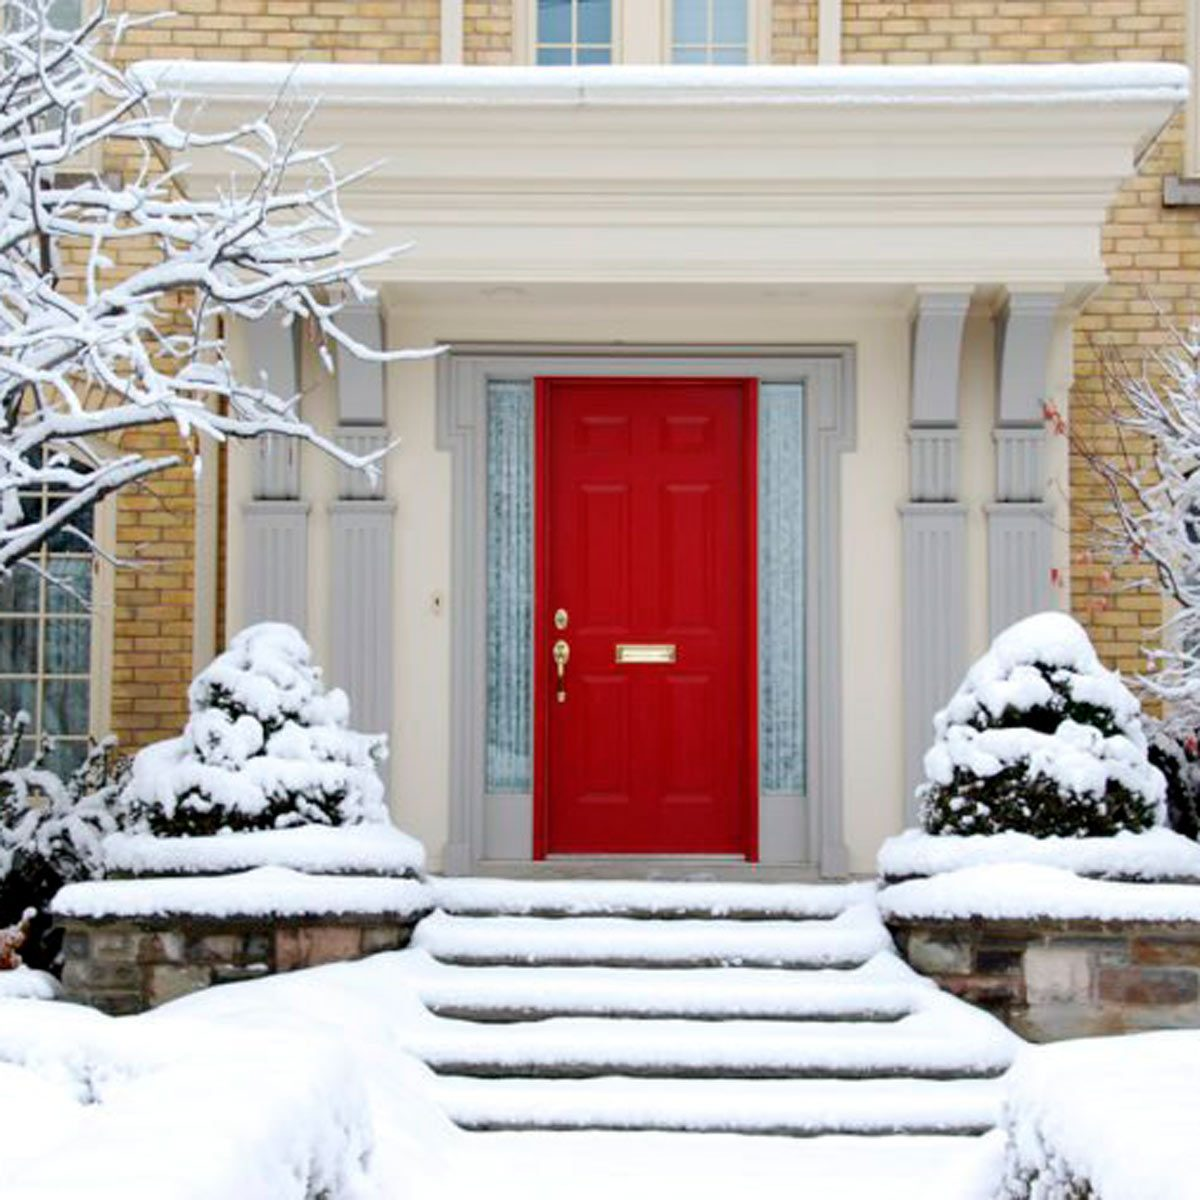 snowy-yard_outsmart-burglars